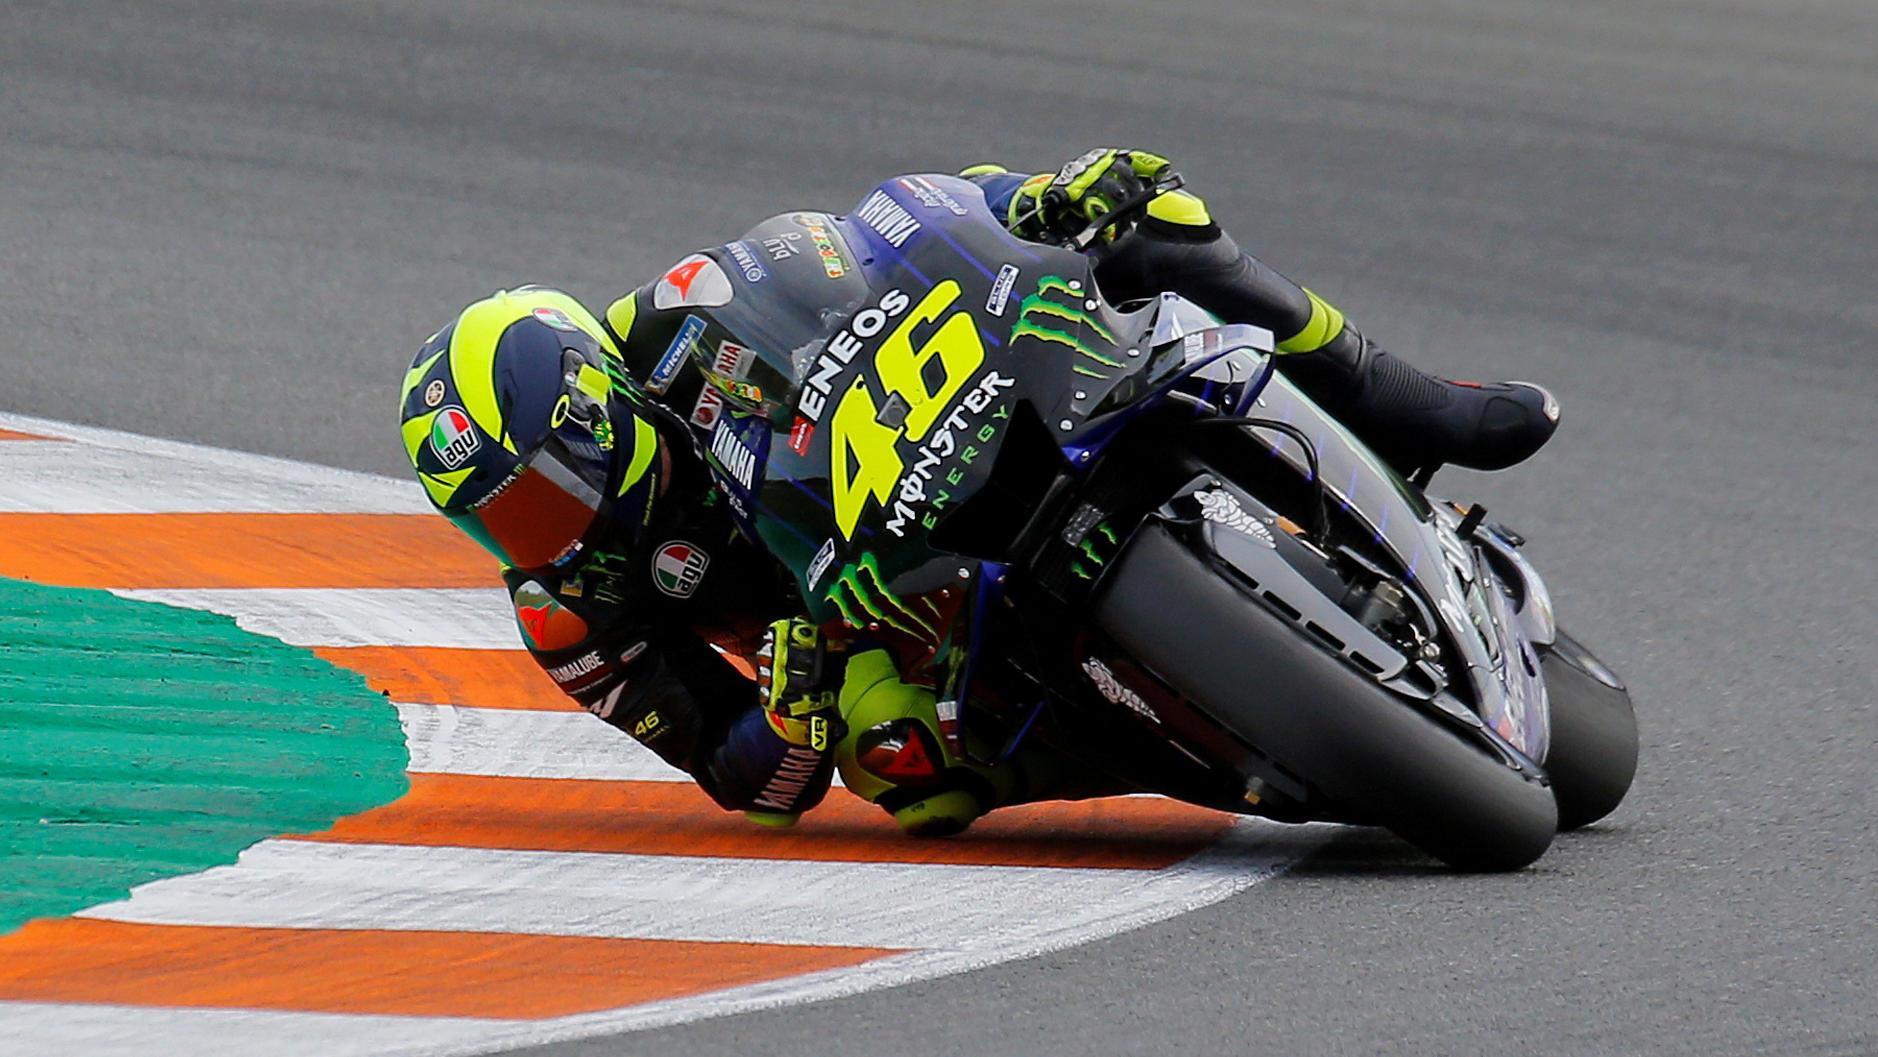 Medienbericht: MotoGP-Legende Valentino Rossi macht 2021 ...